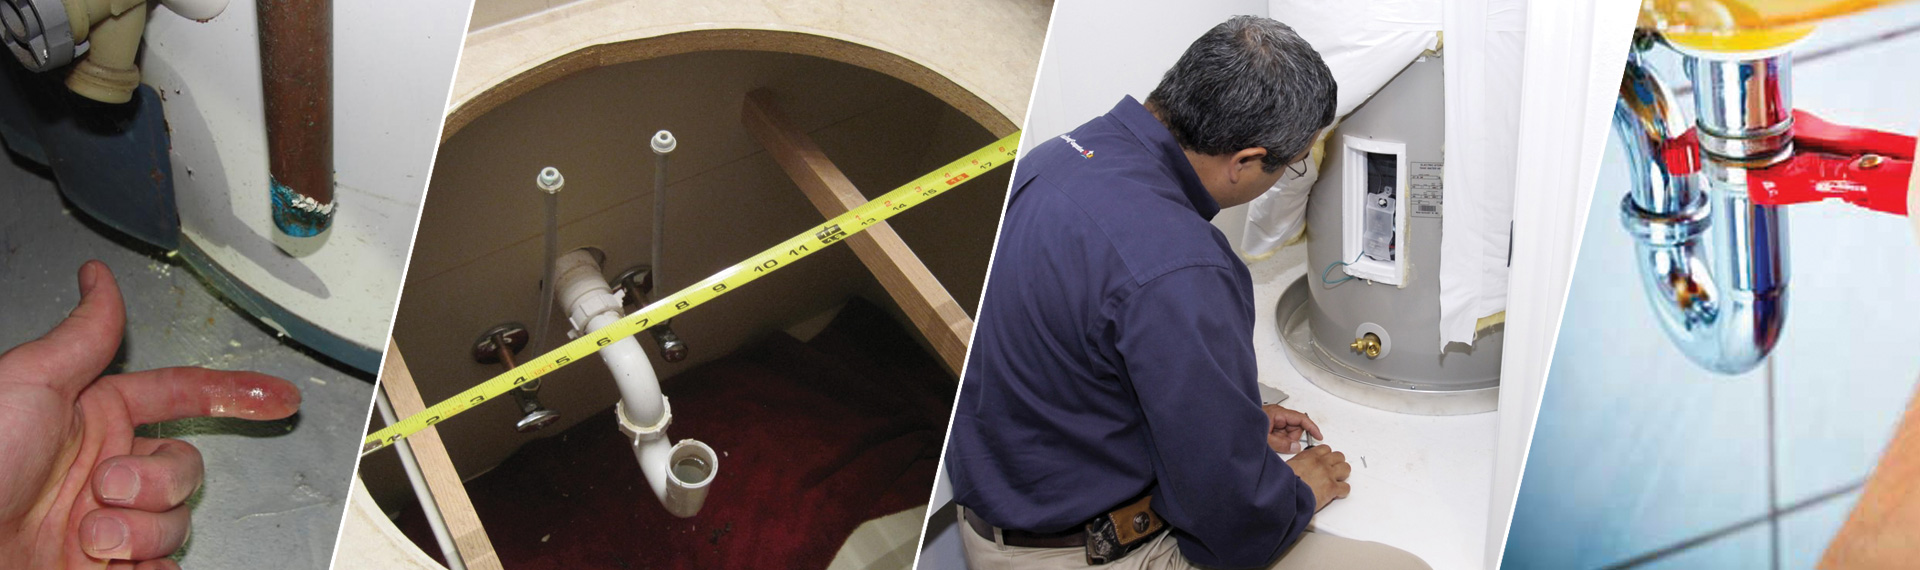 Promax Water Heater & Plumbing Santee CA